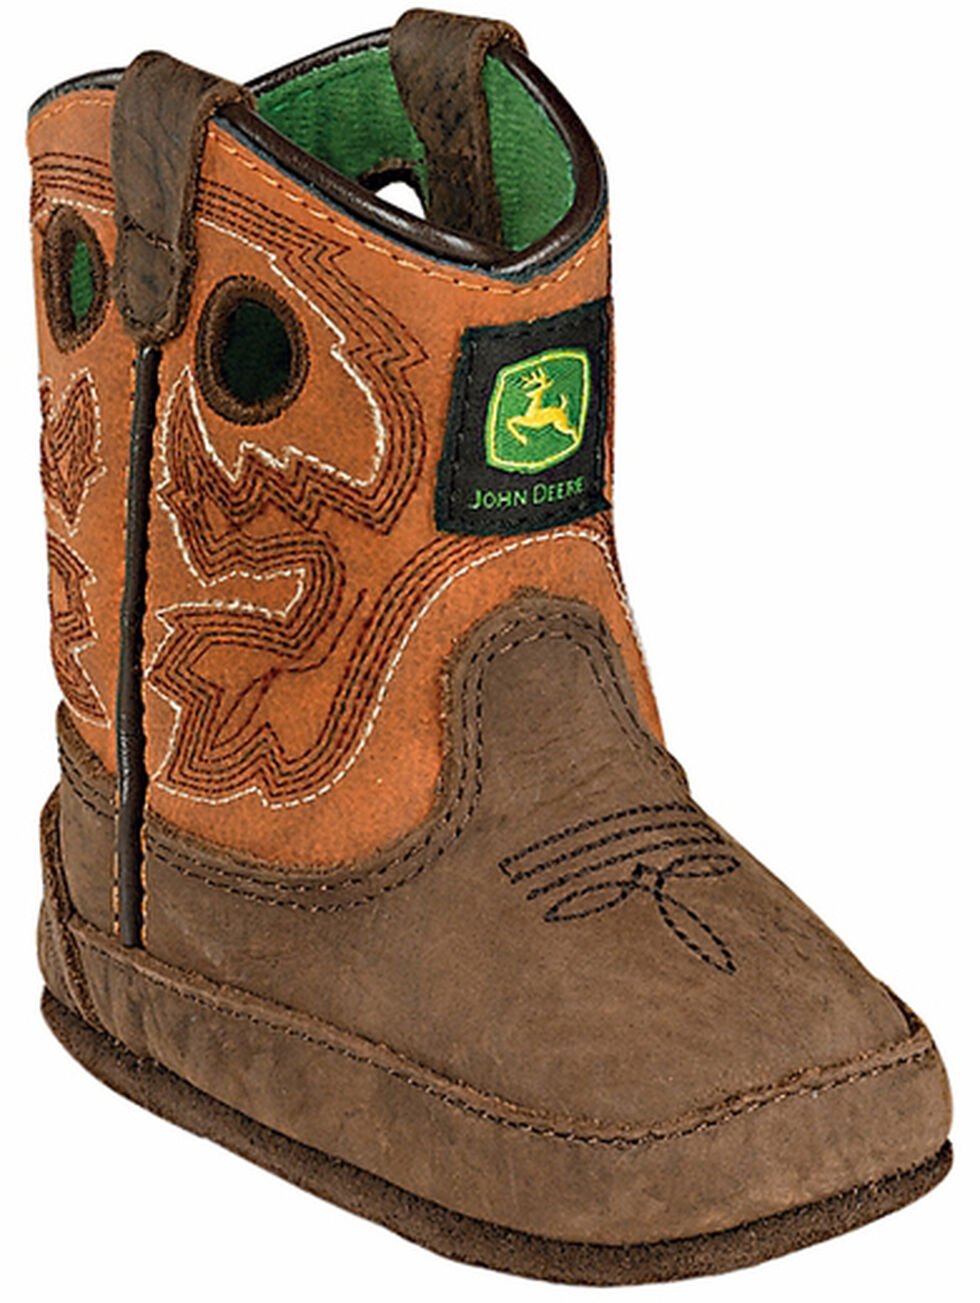 John Deere Infant Boys' Johnny Popper Western Crib Boots, Brown, hi-res